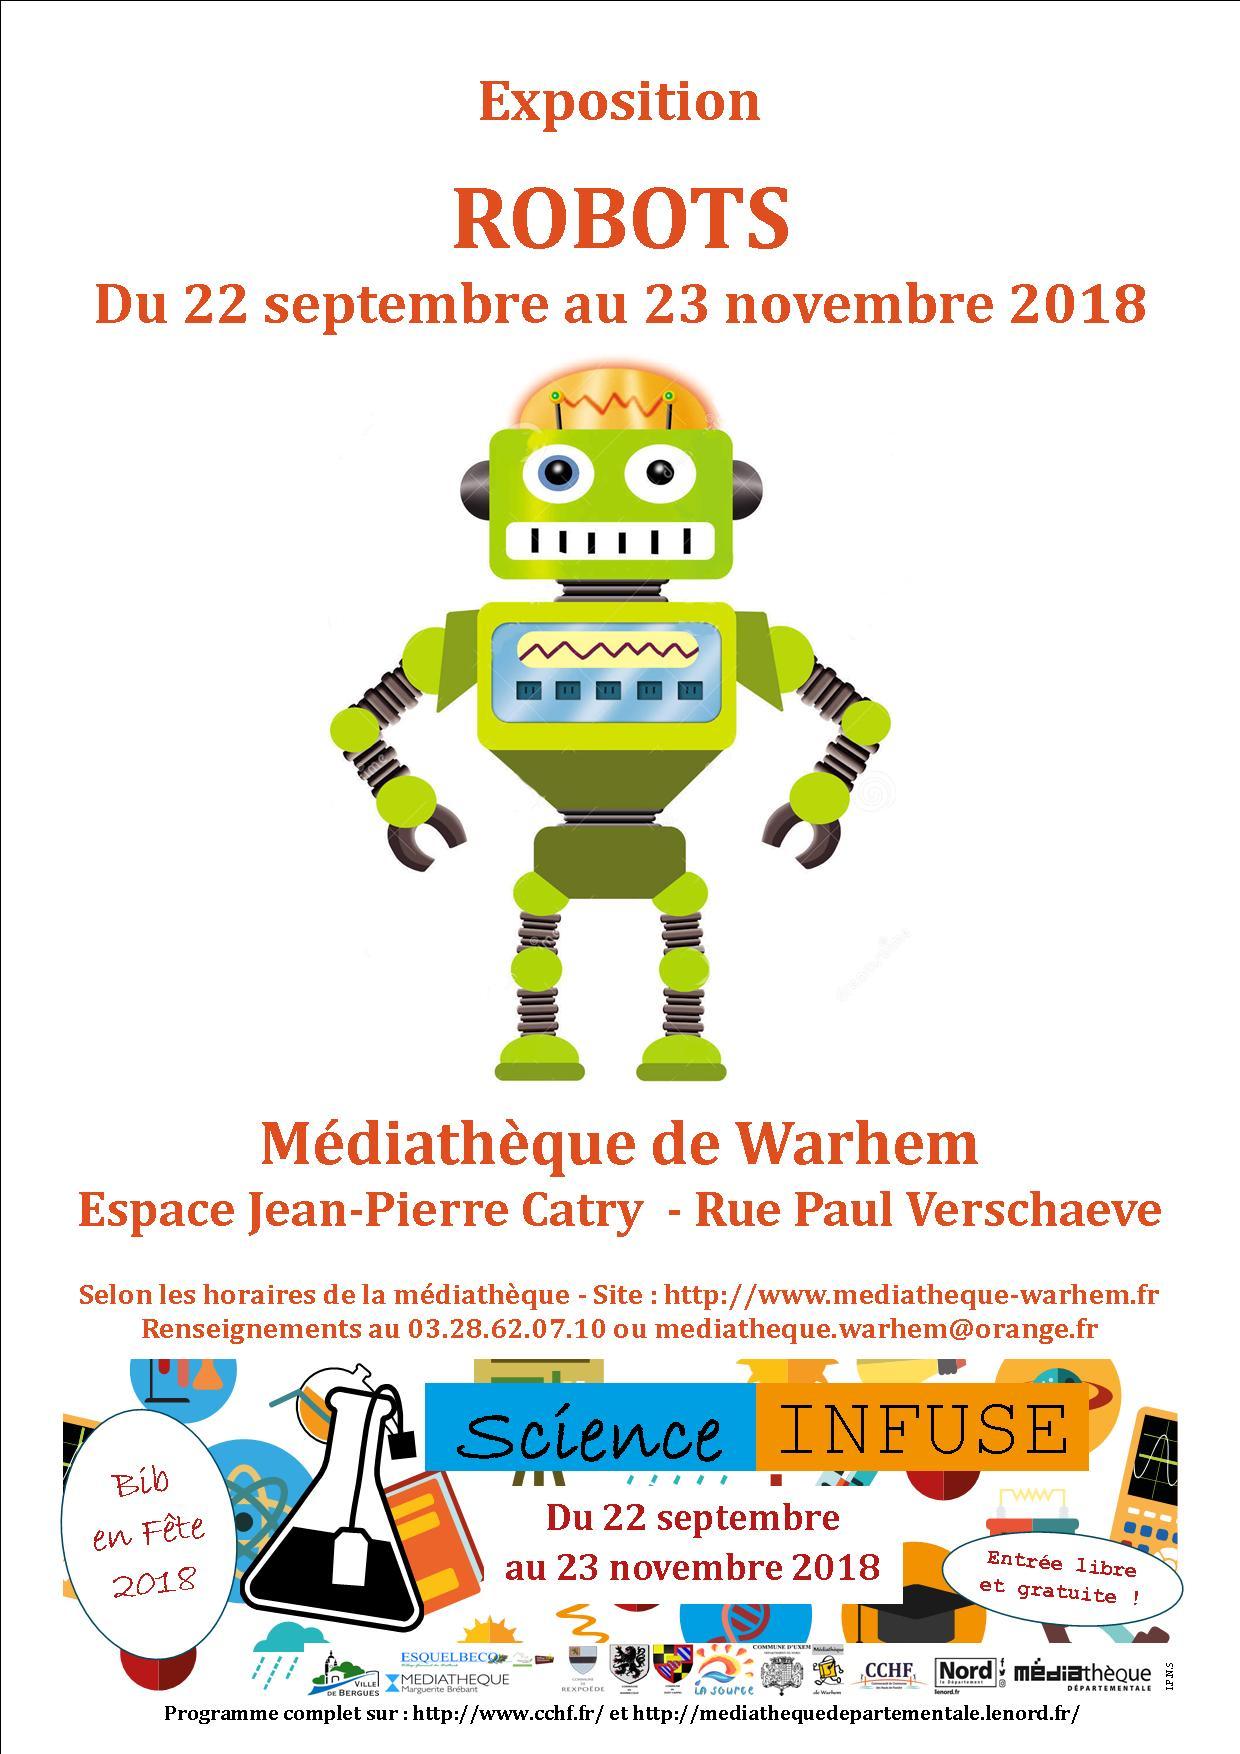 warhem_-_expo_robots.jpg